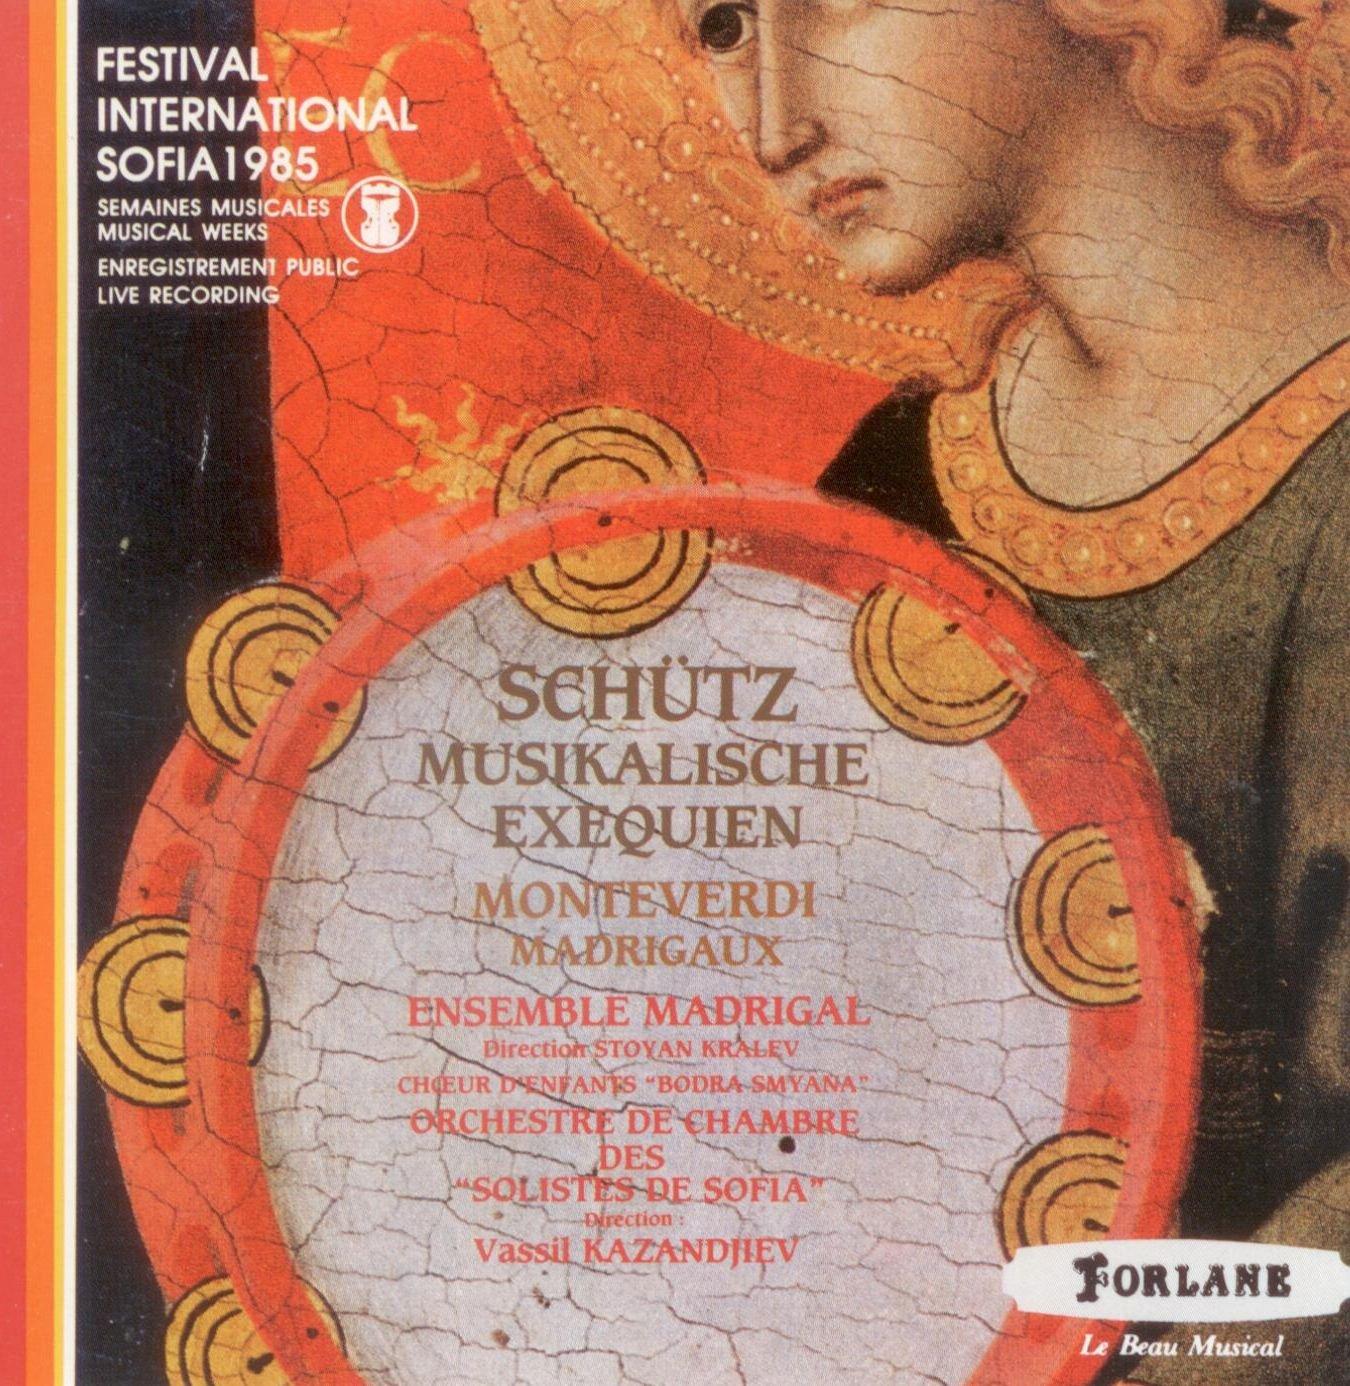 Schütz: Musikalische Exequien / Monteverdi: Madrigals - Live from Sofia International Festival, 1985